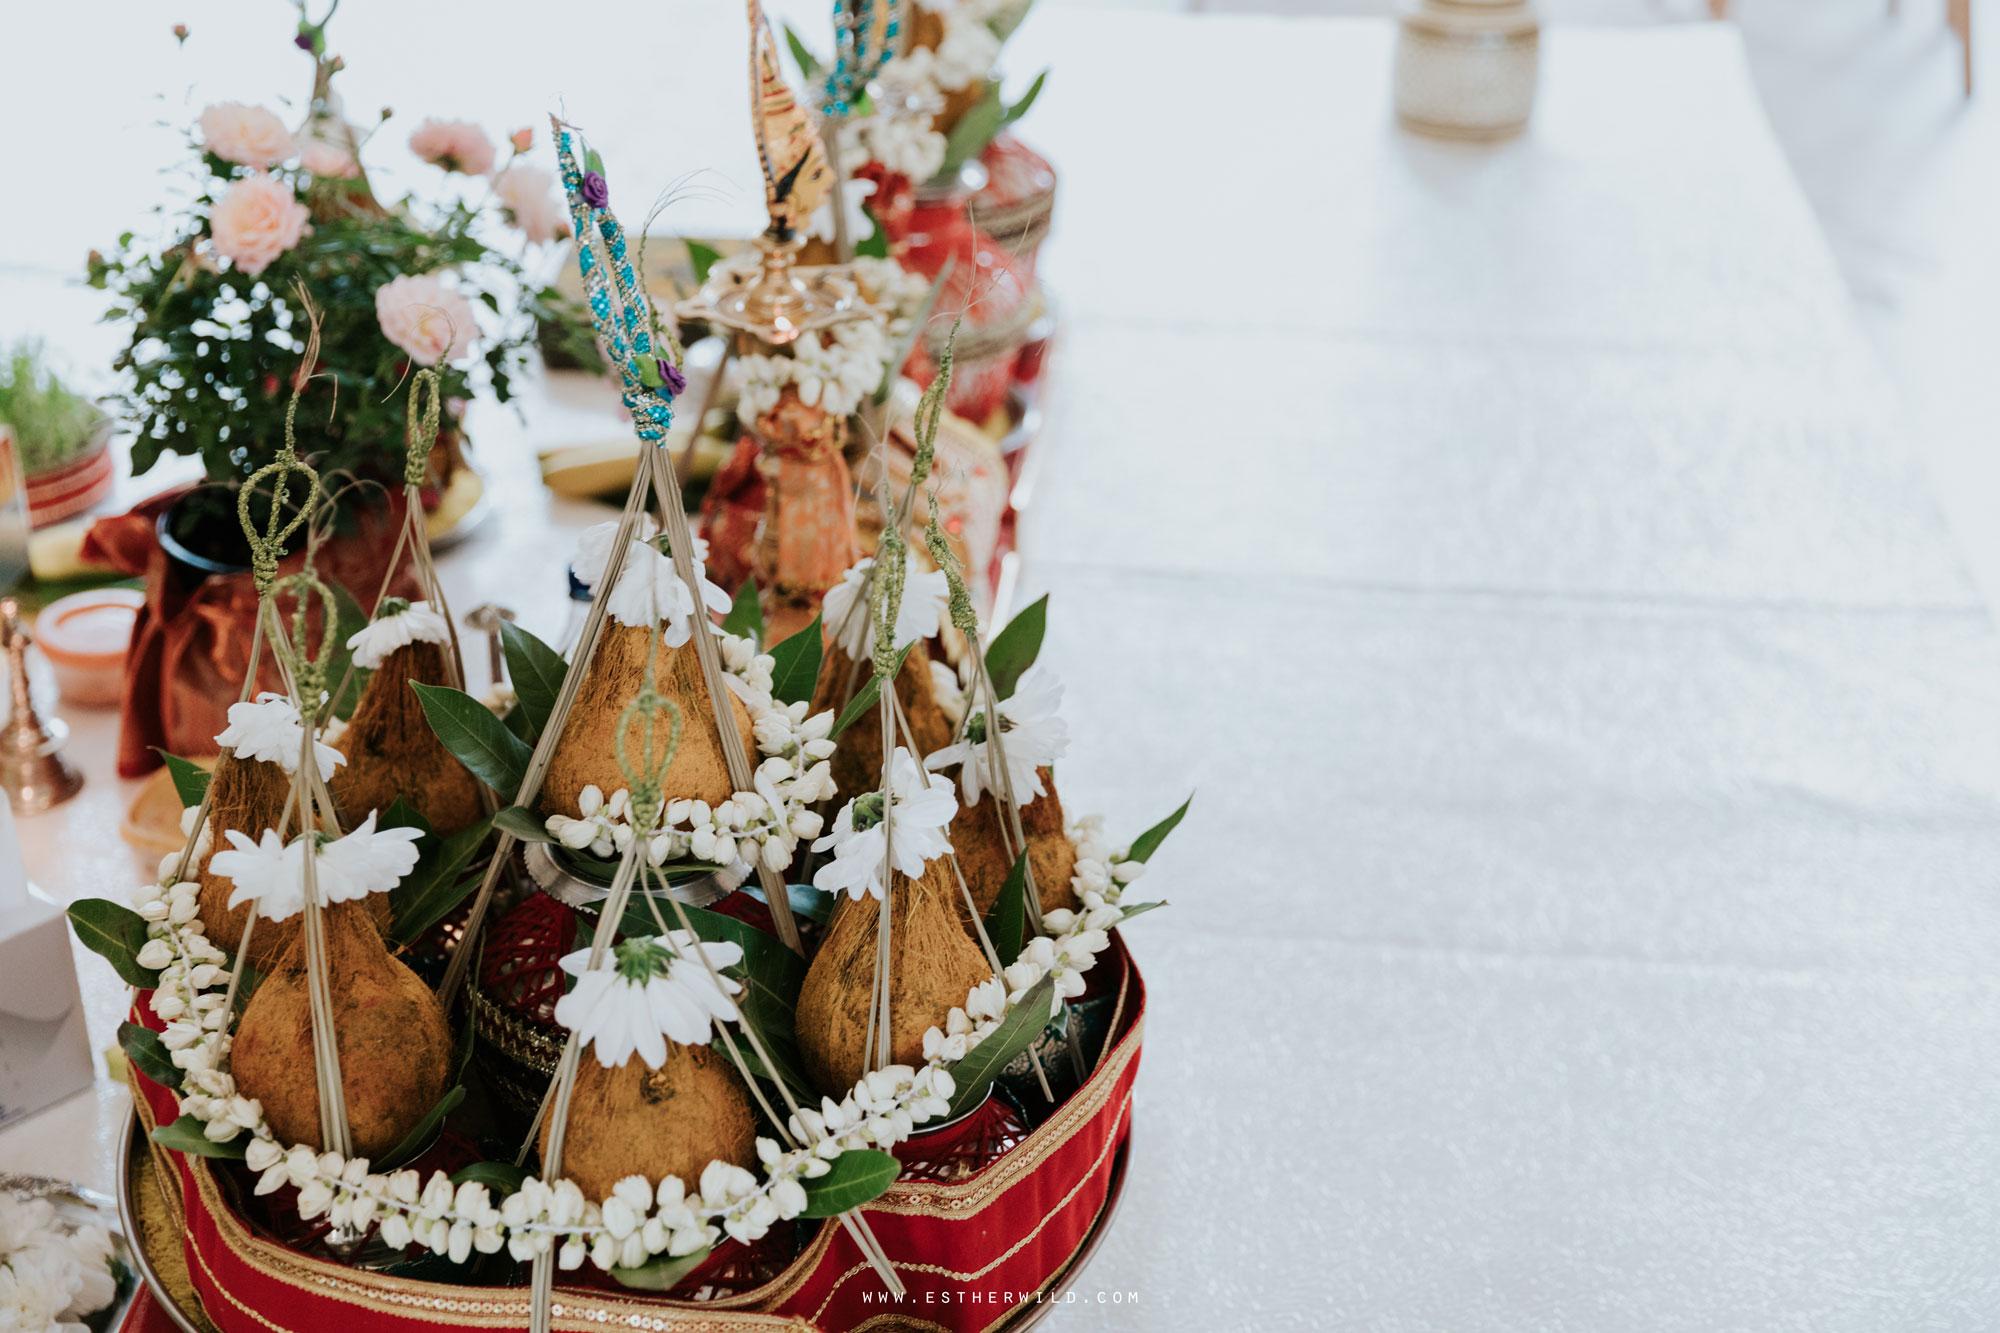 Northbrook_Park_Farnham_Surrey_London_Wedding_Hindu_Fusion_Esther_Wild_Photographer_IMG_3163.jpg